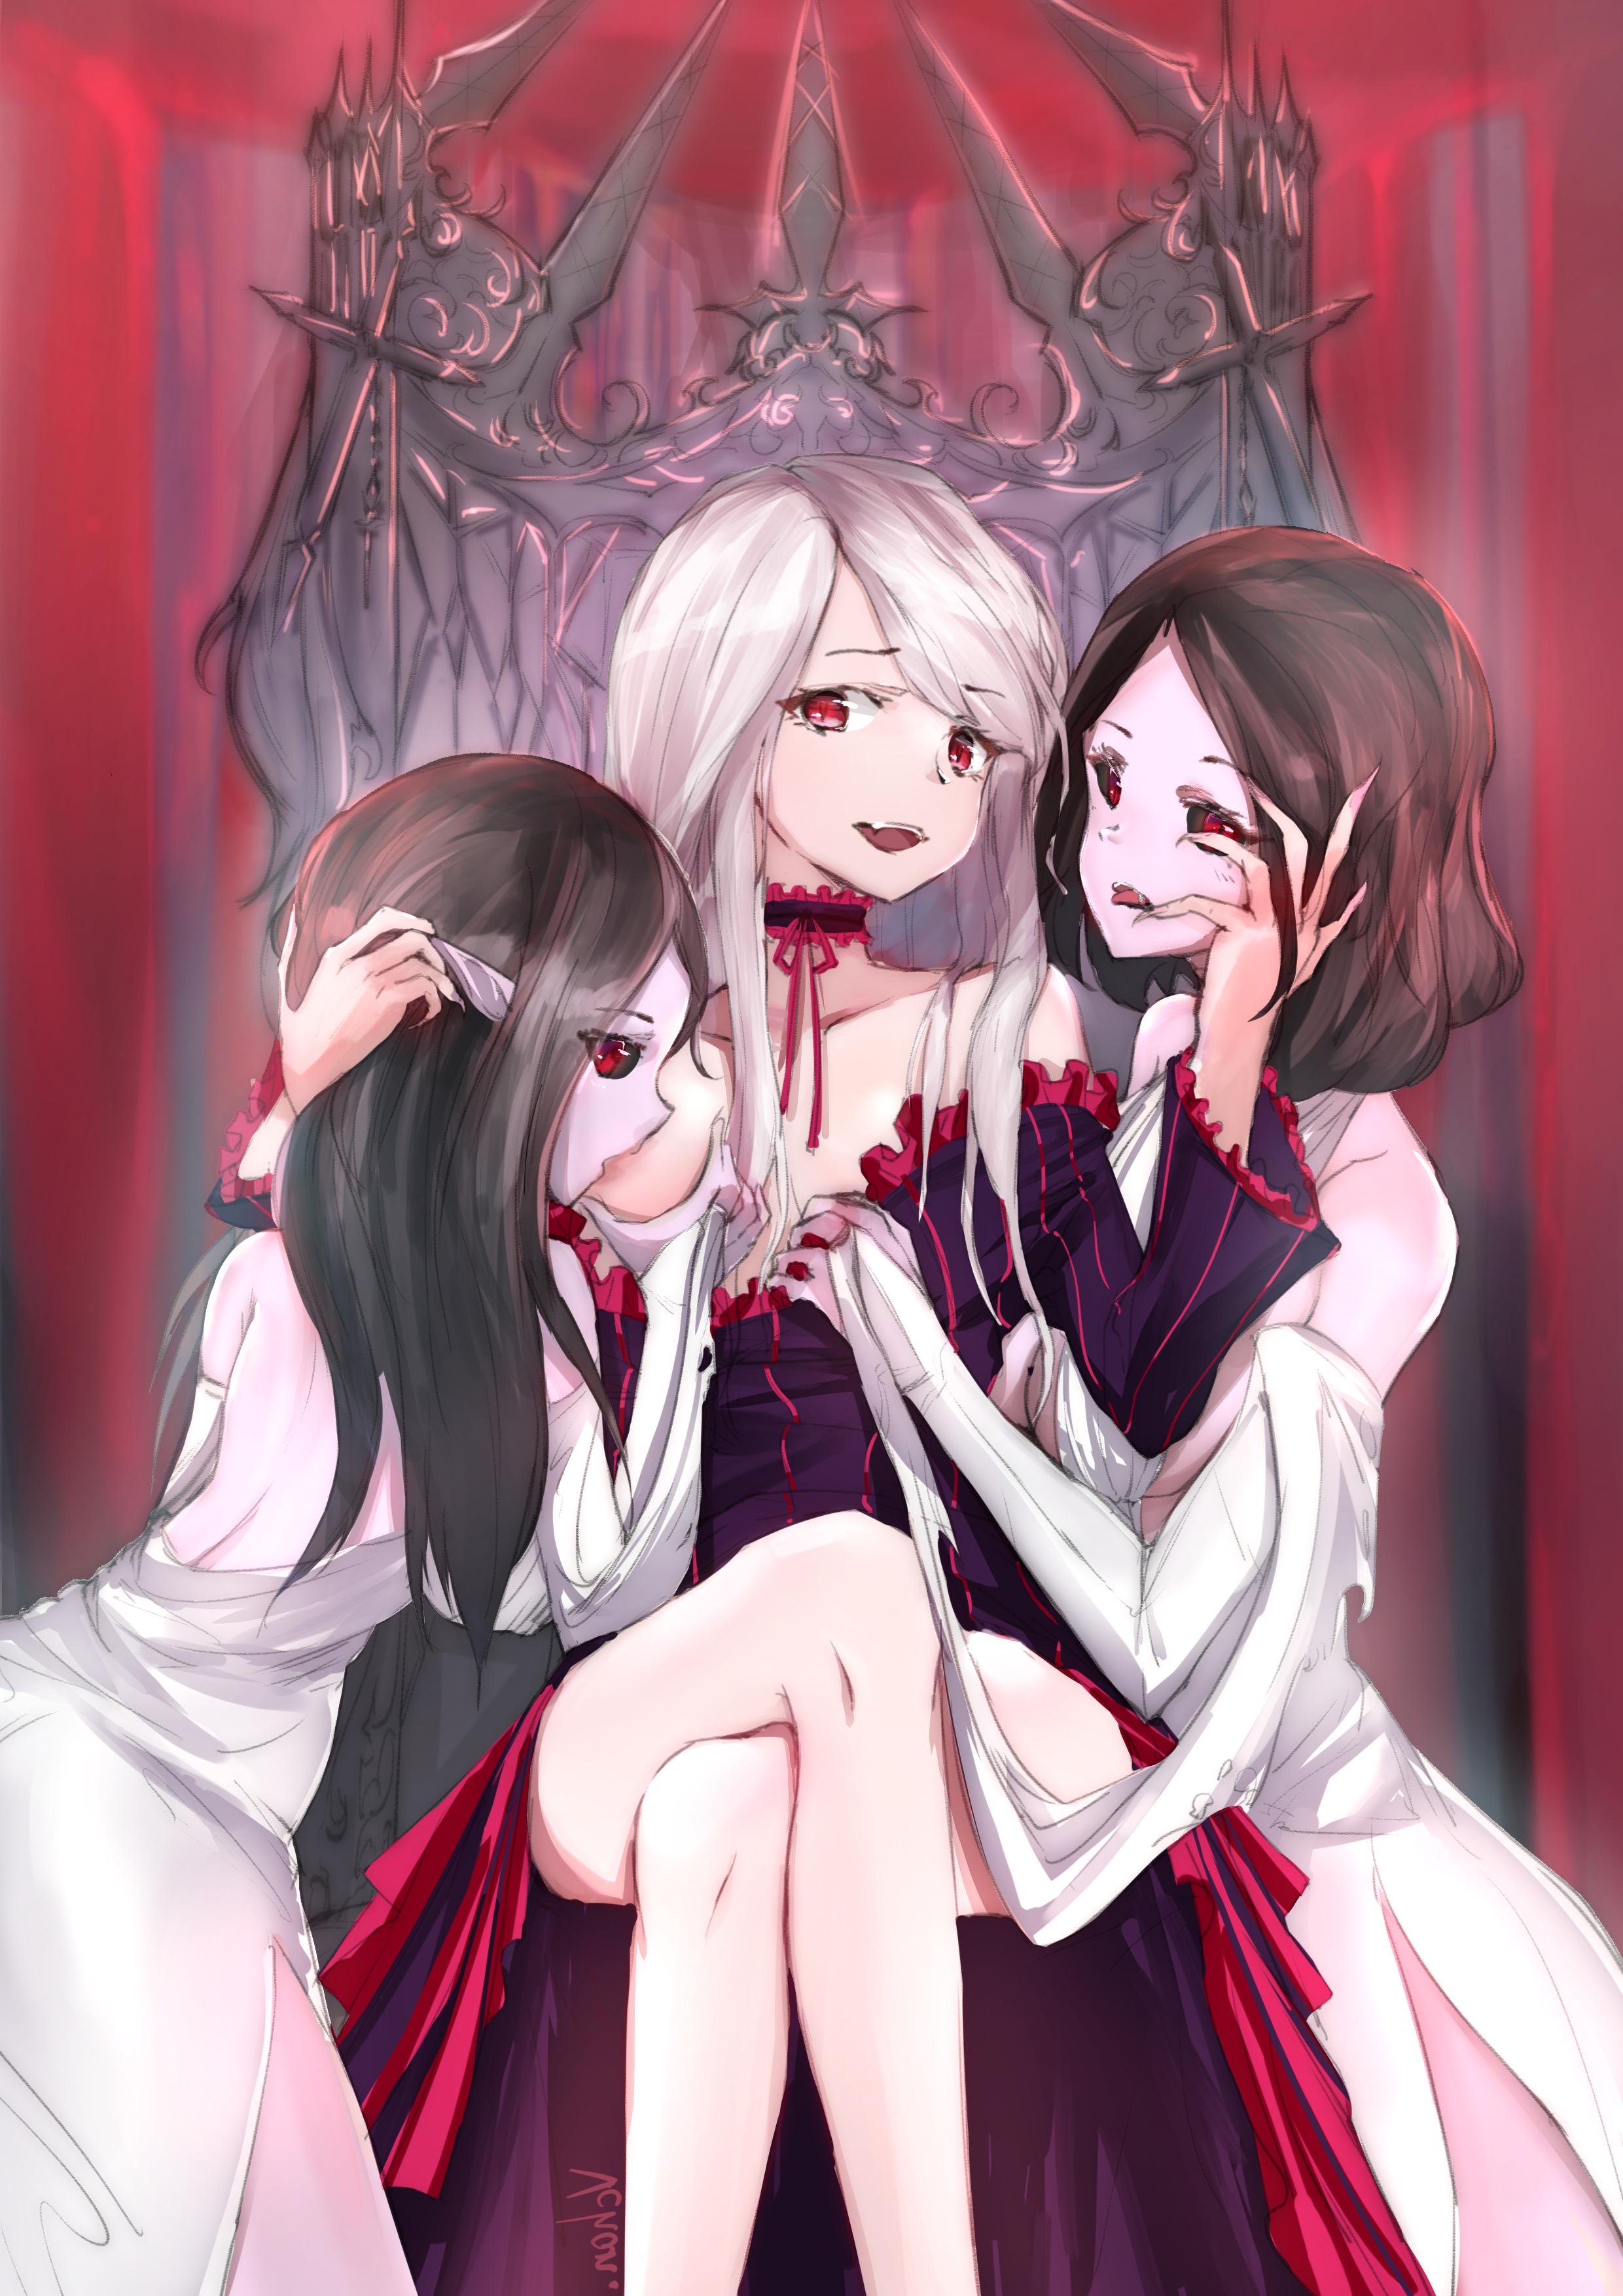 Anime lesbian werewolf vampire